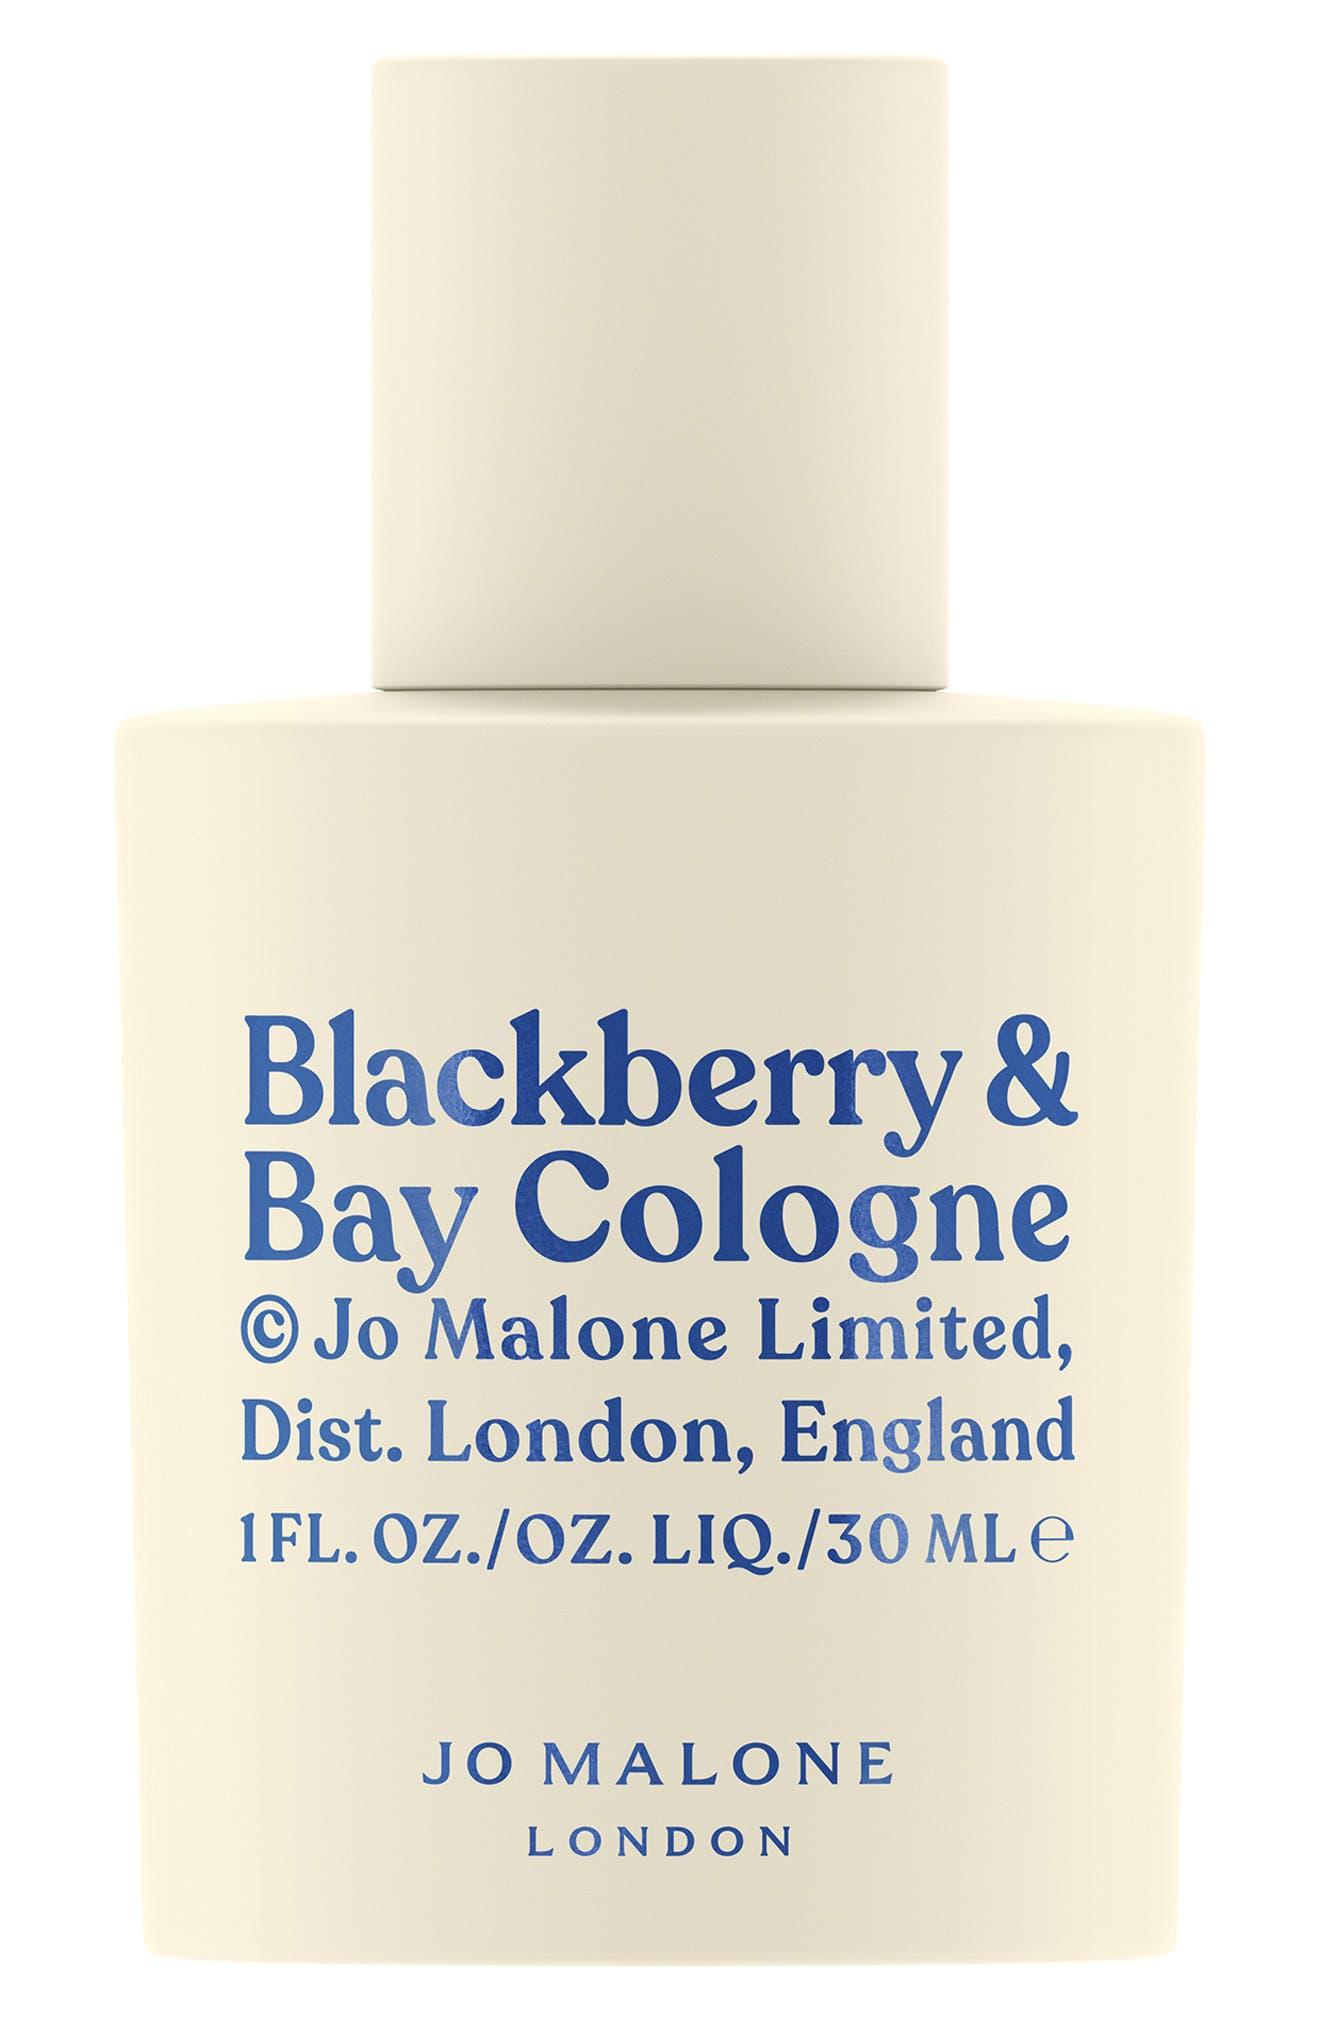 Jo Malone London(TM) Blackberry & Bay Cologne (Limited Edition)